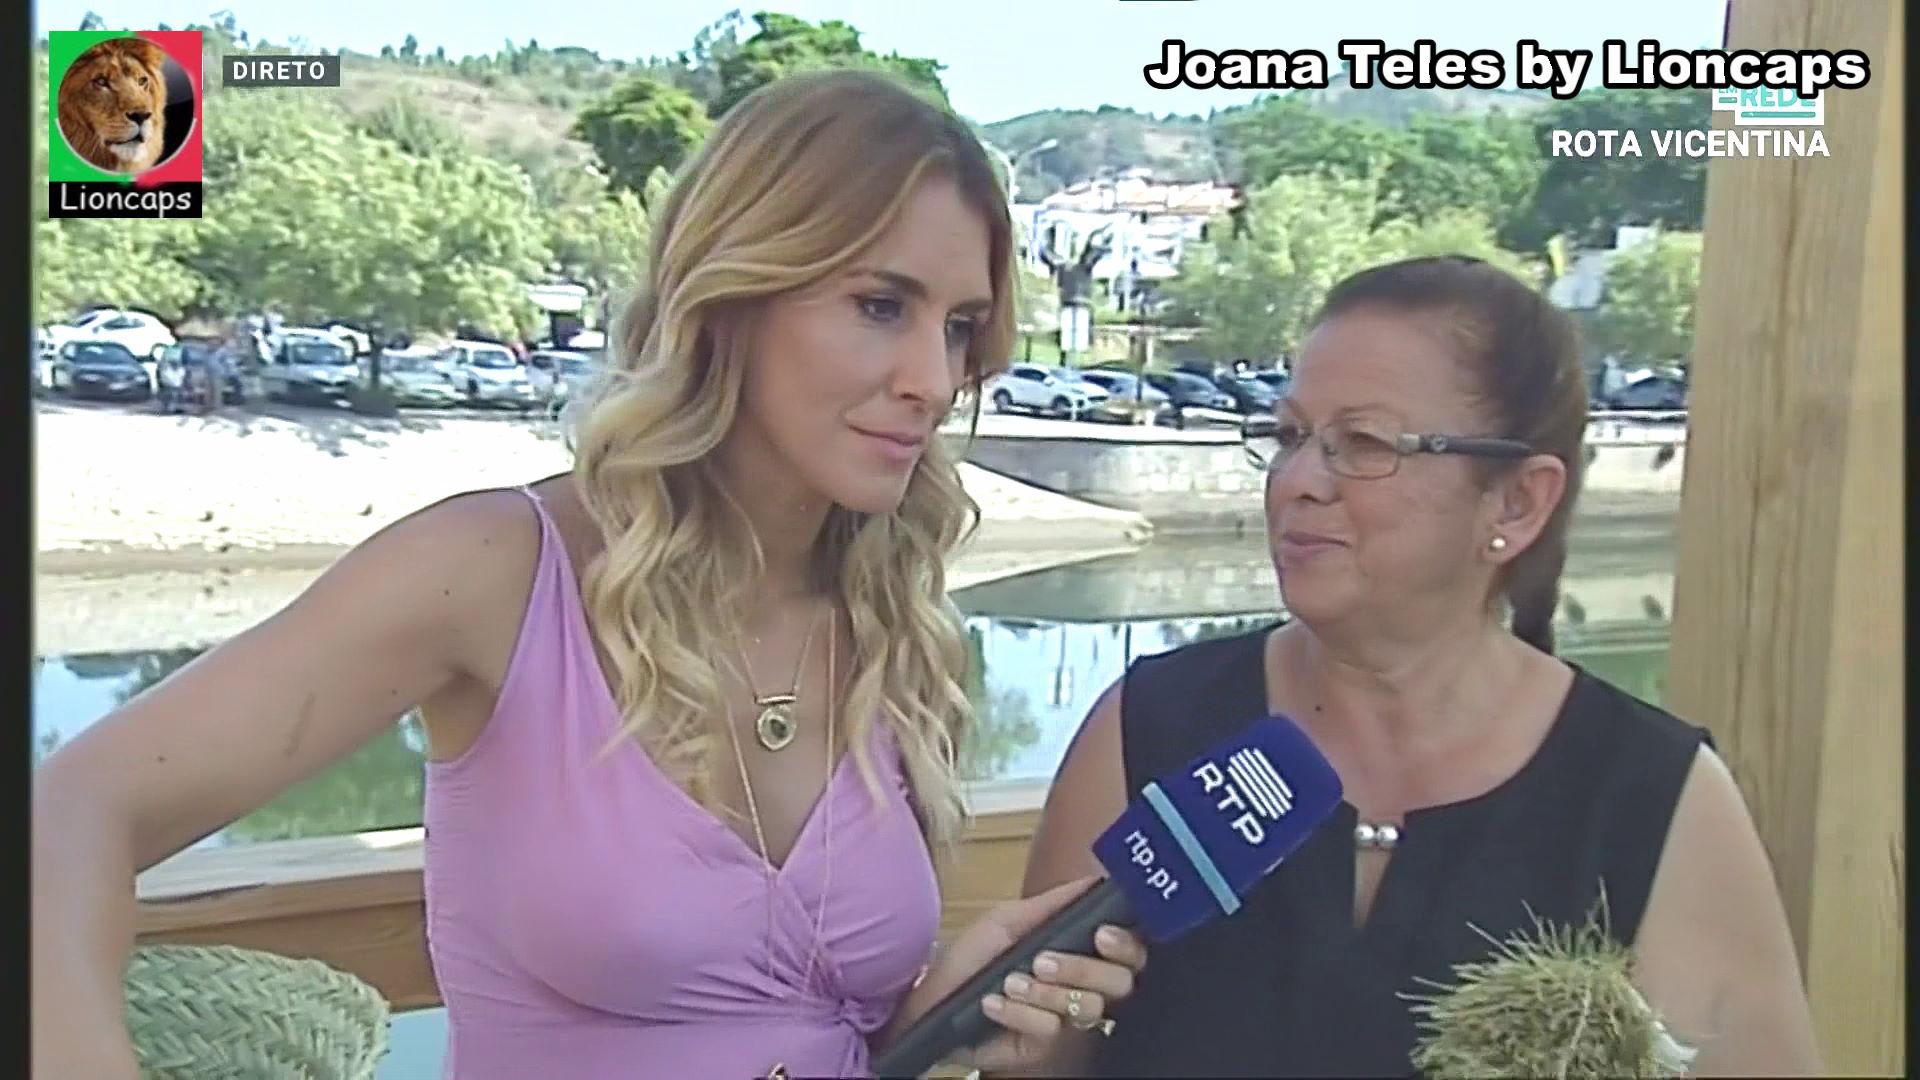 976691733_joana_teles_vs200125_11620_122_451lo.JPG